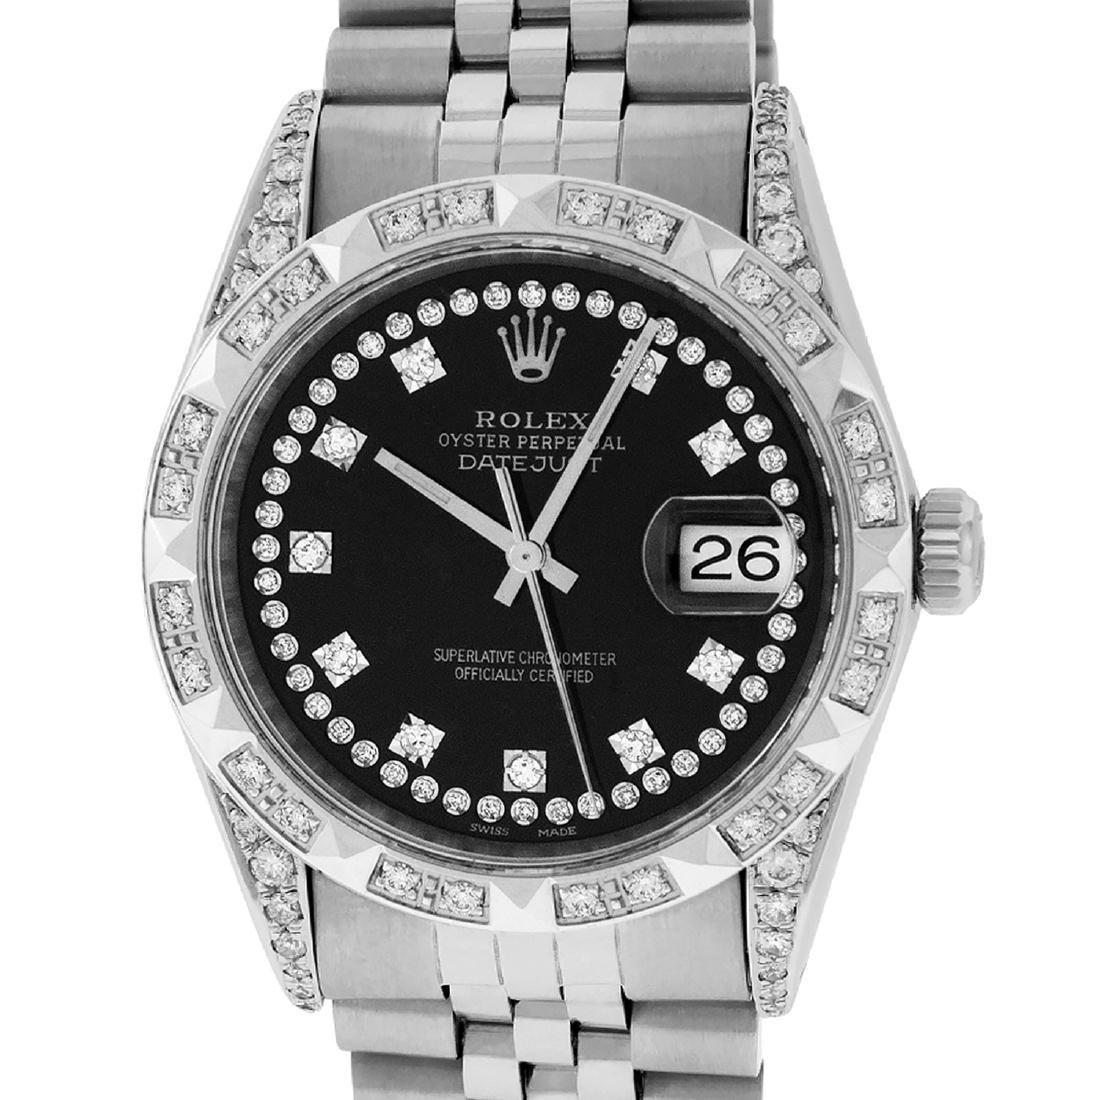 Rolex Mens Datejust Watch SS & 18K White Gold Black